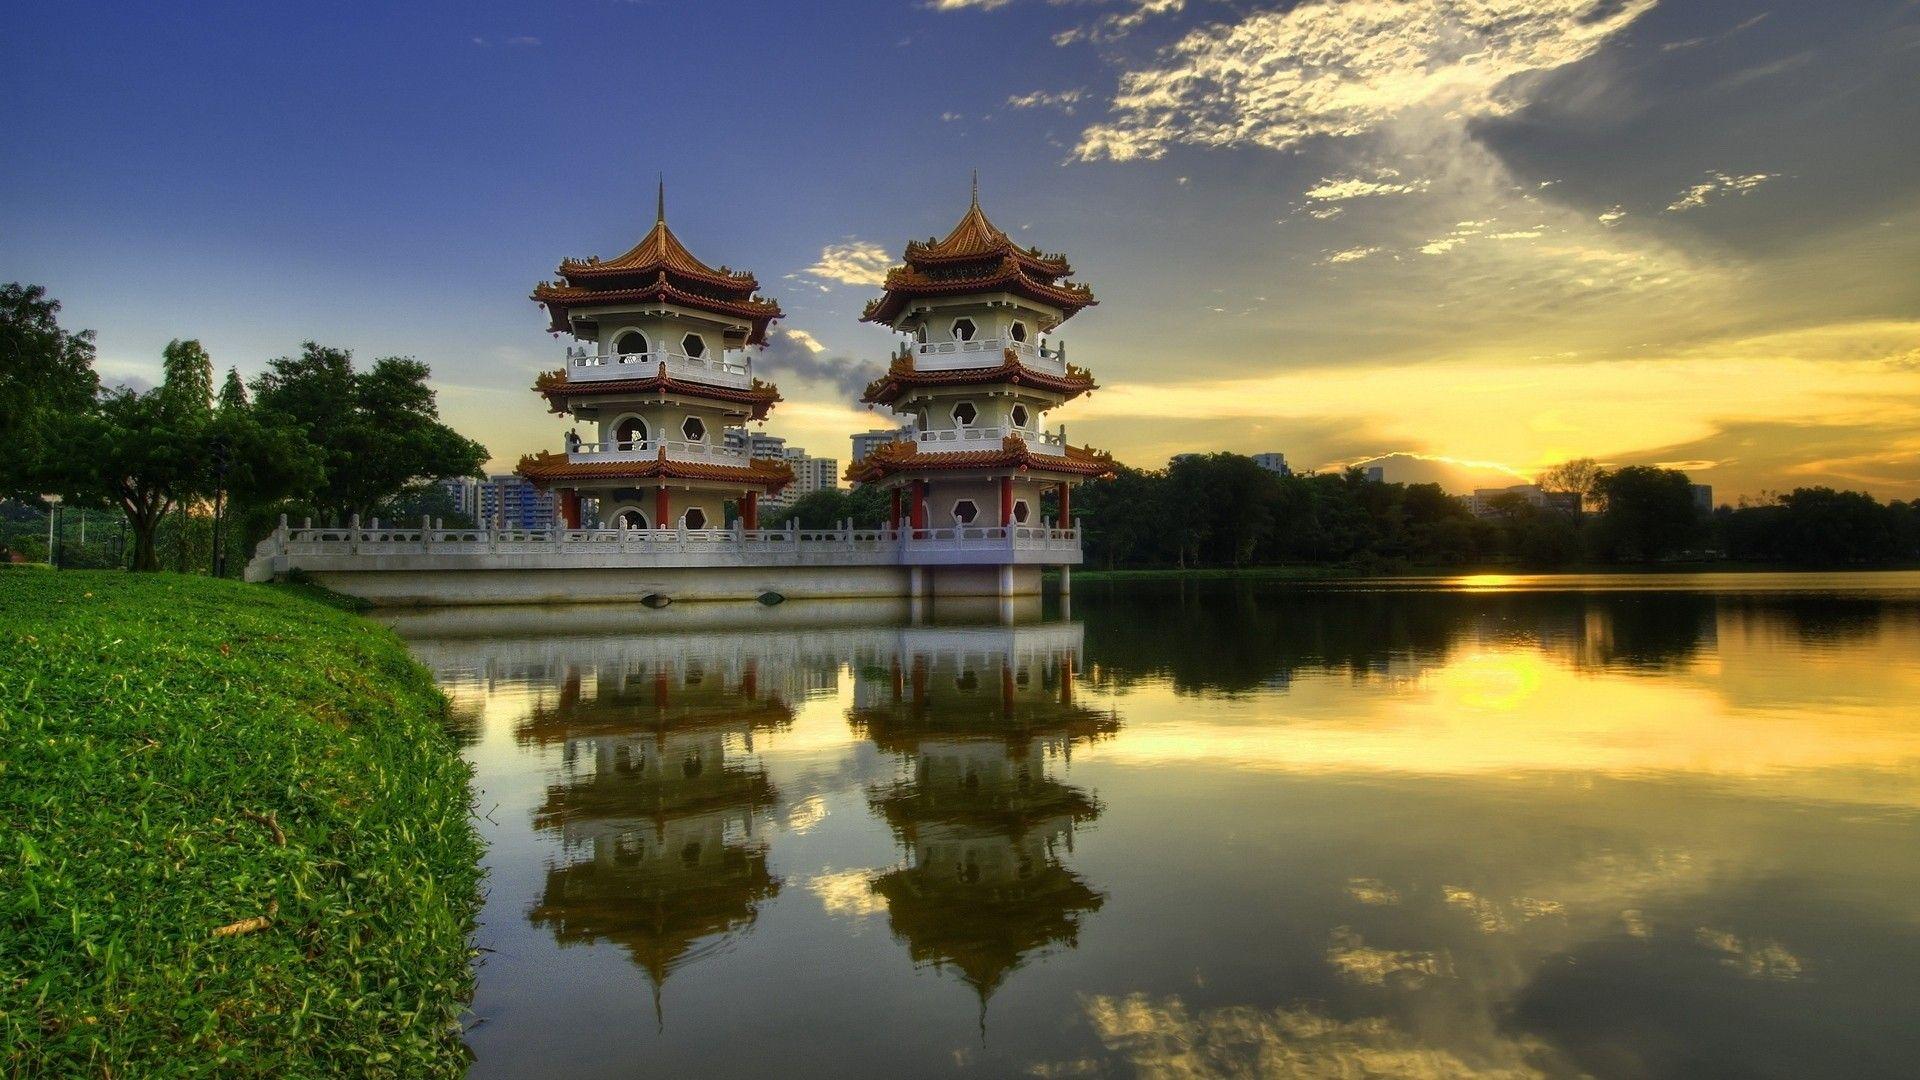 Pagoda best Wallpaper